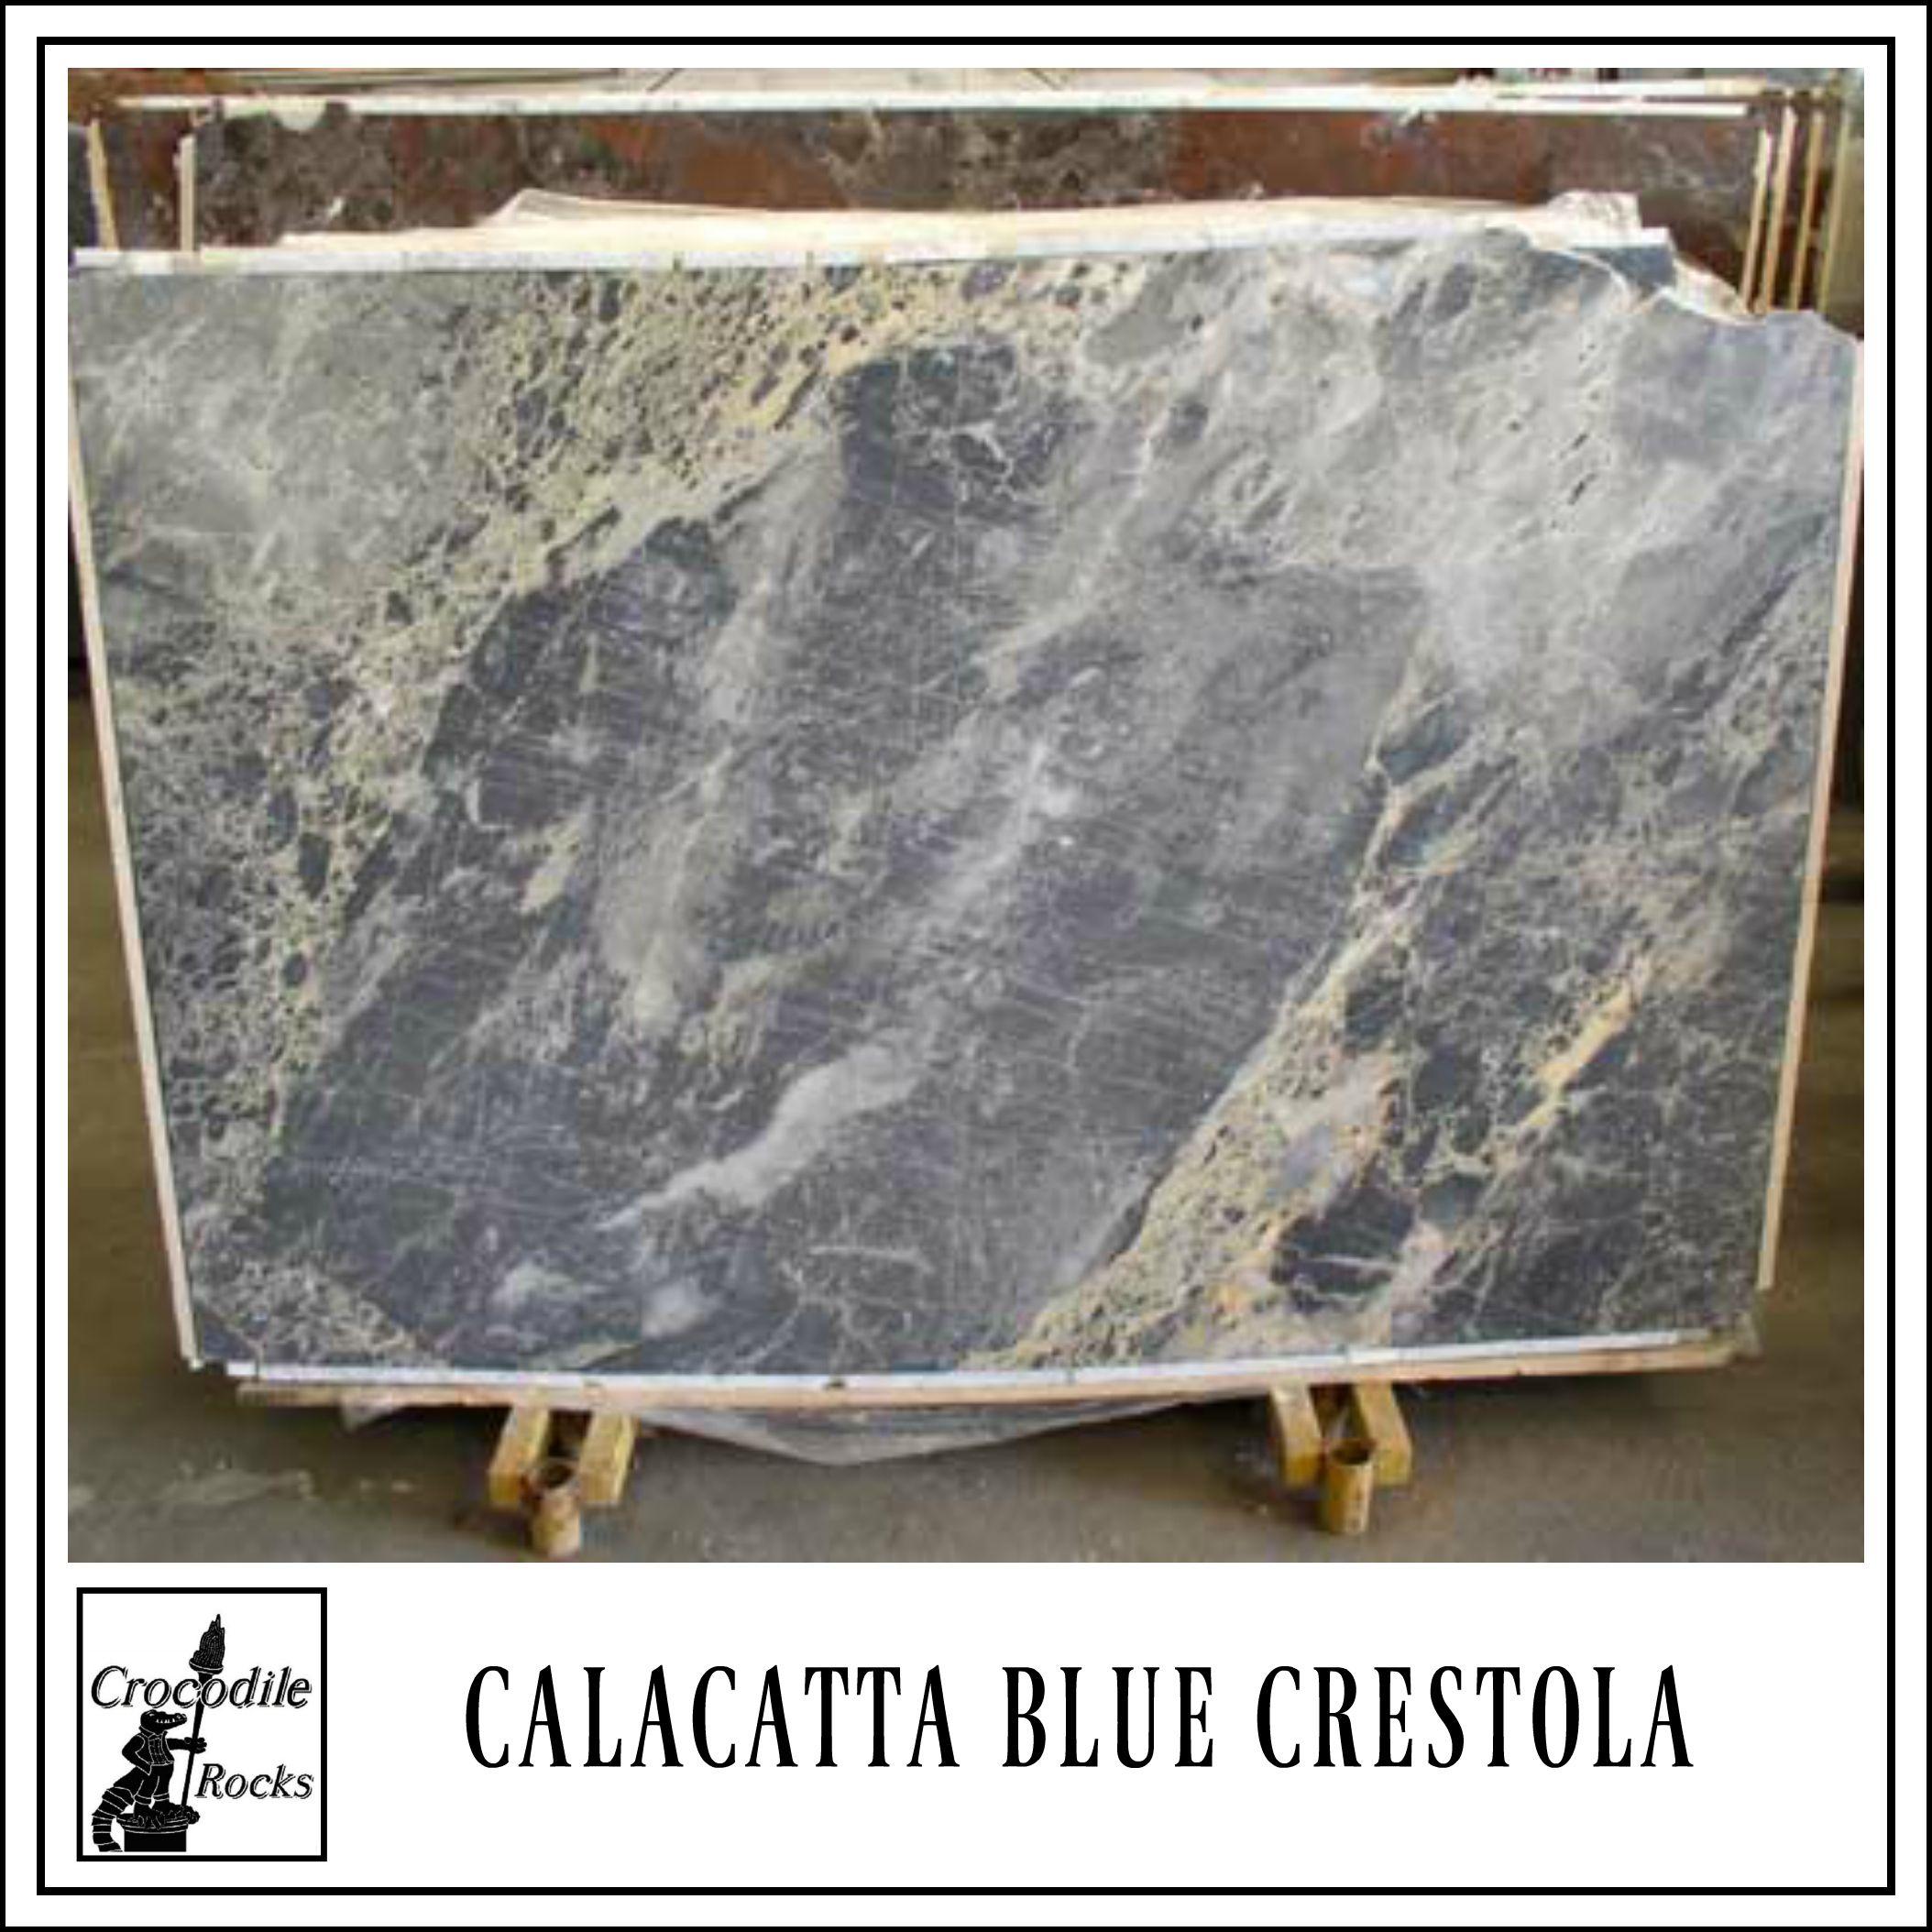 Washington marble and granite - Calacatta Blue Crestola Marble It Has The Most Beautiful Grey Blue Undertone Hue This